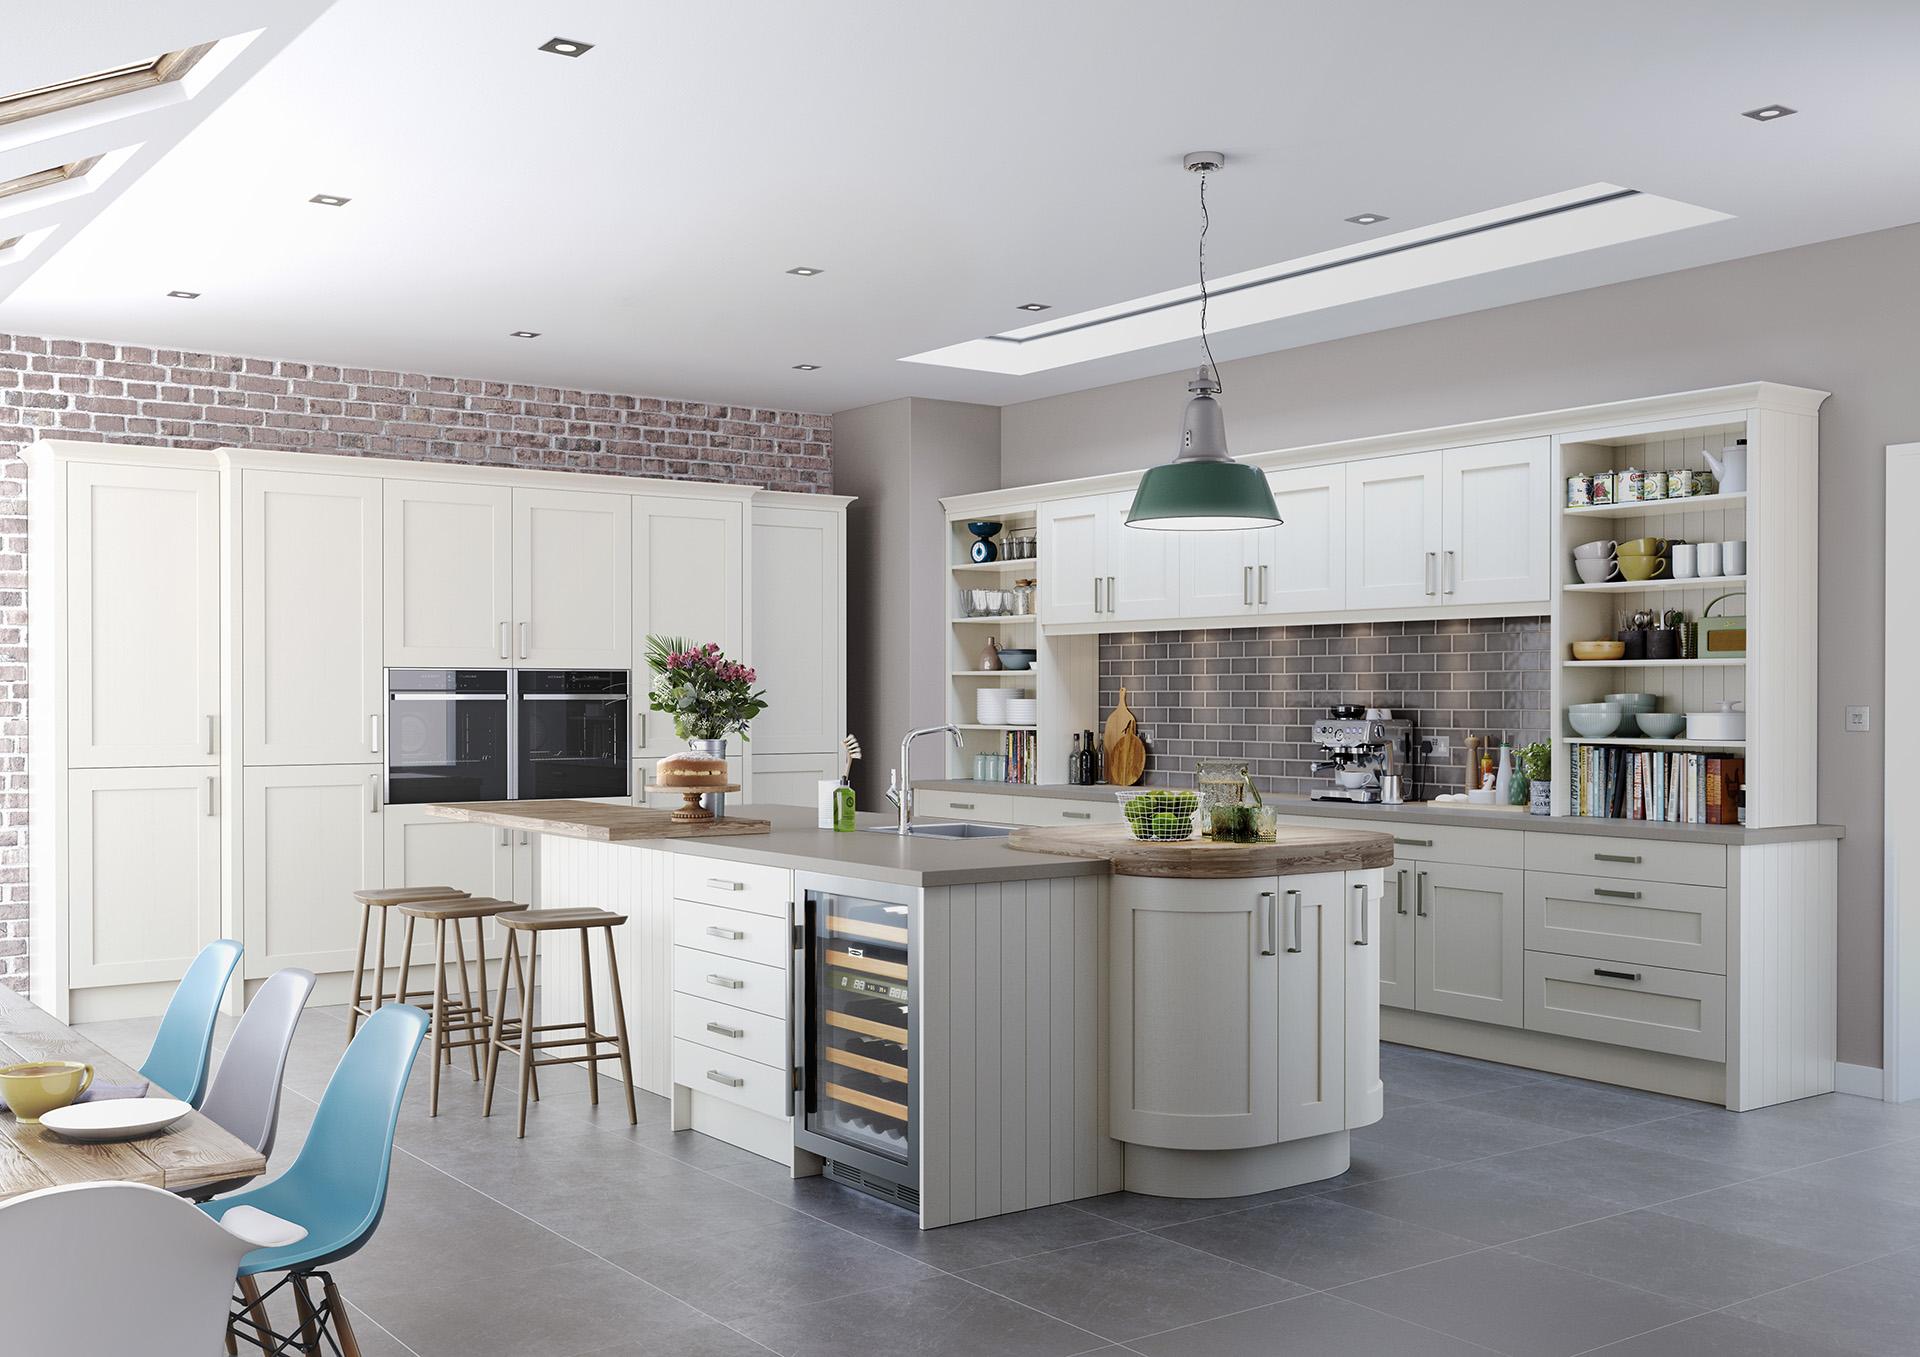 Cockermouth Kitchen Co Cumbria